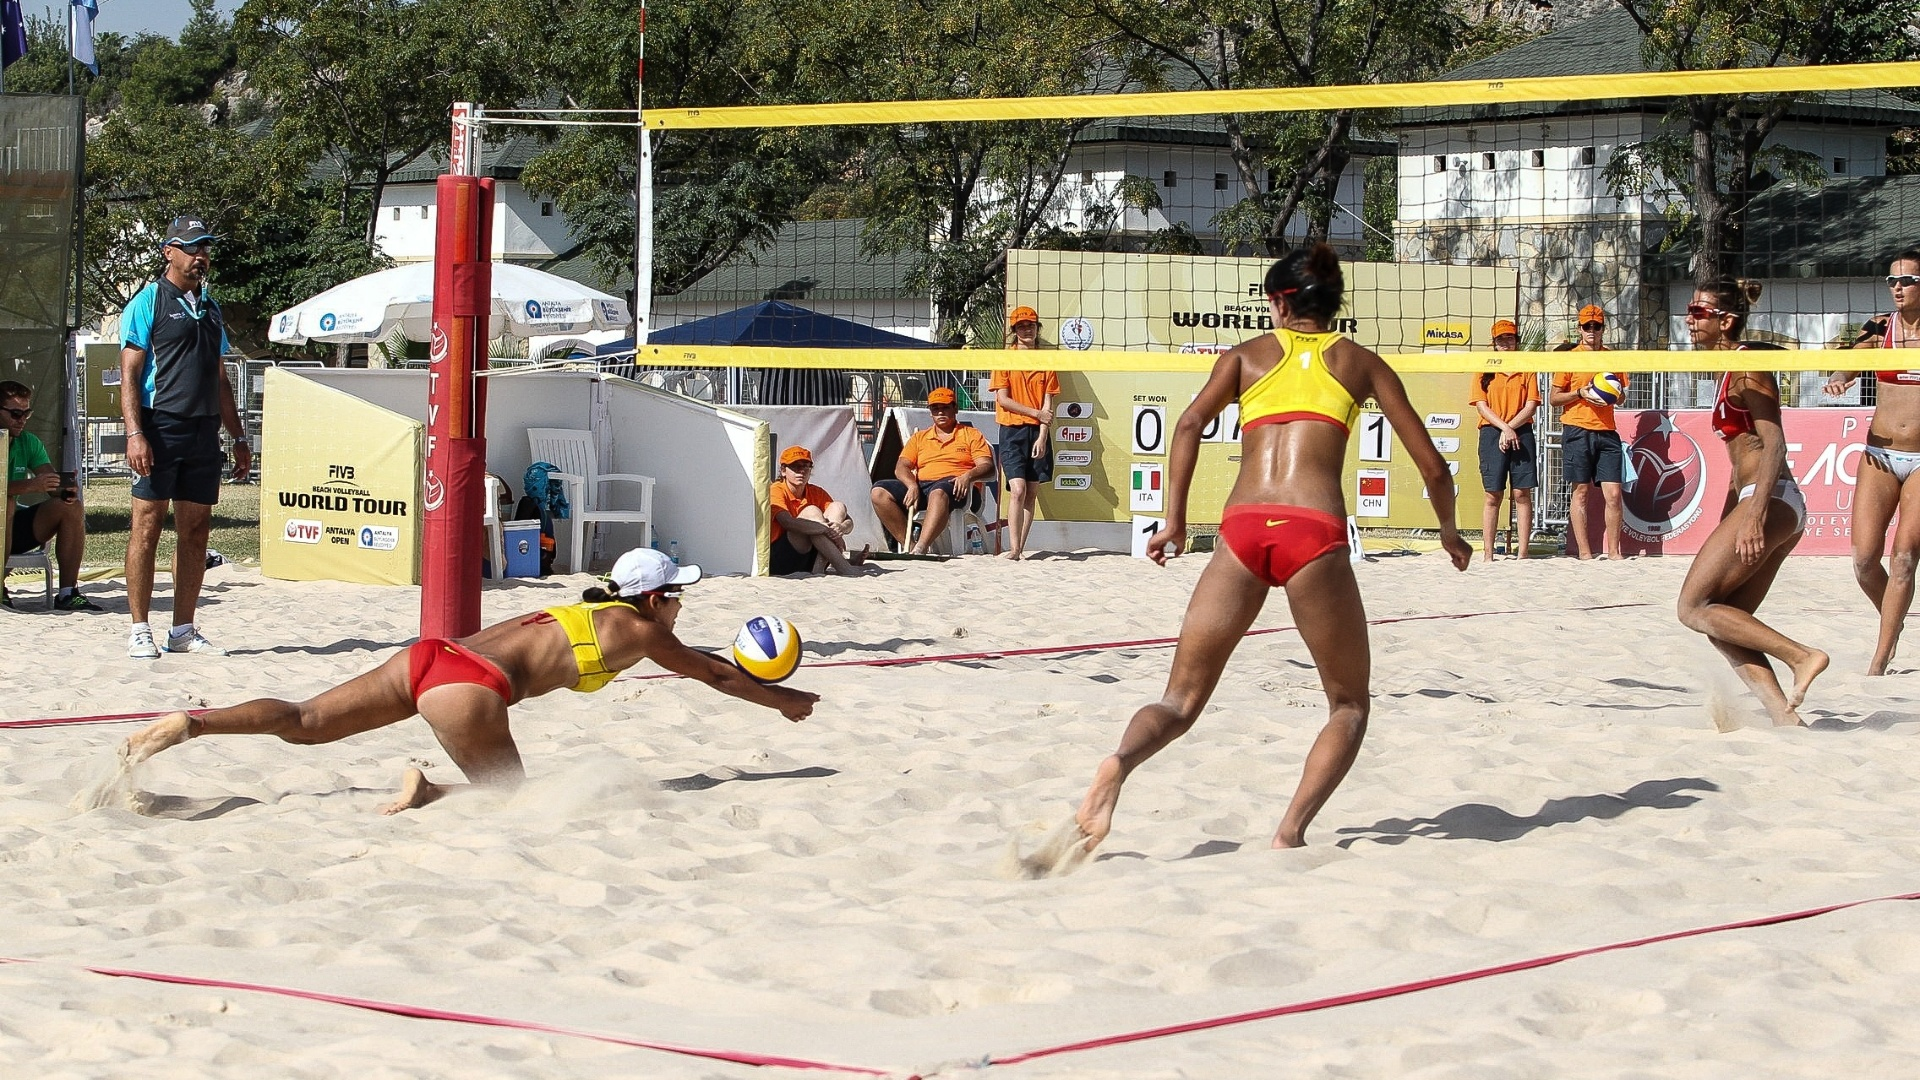 Etapa do circuito mundial de vôlei de praia, na Turquia